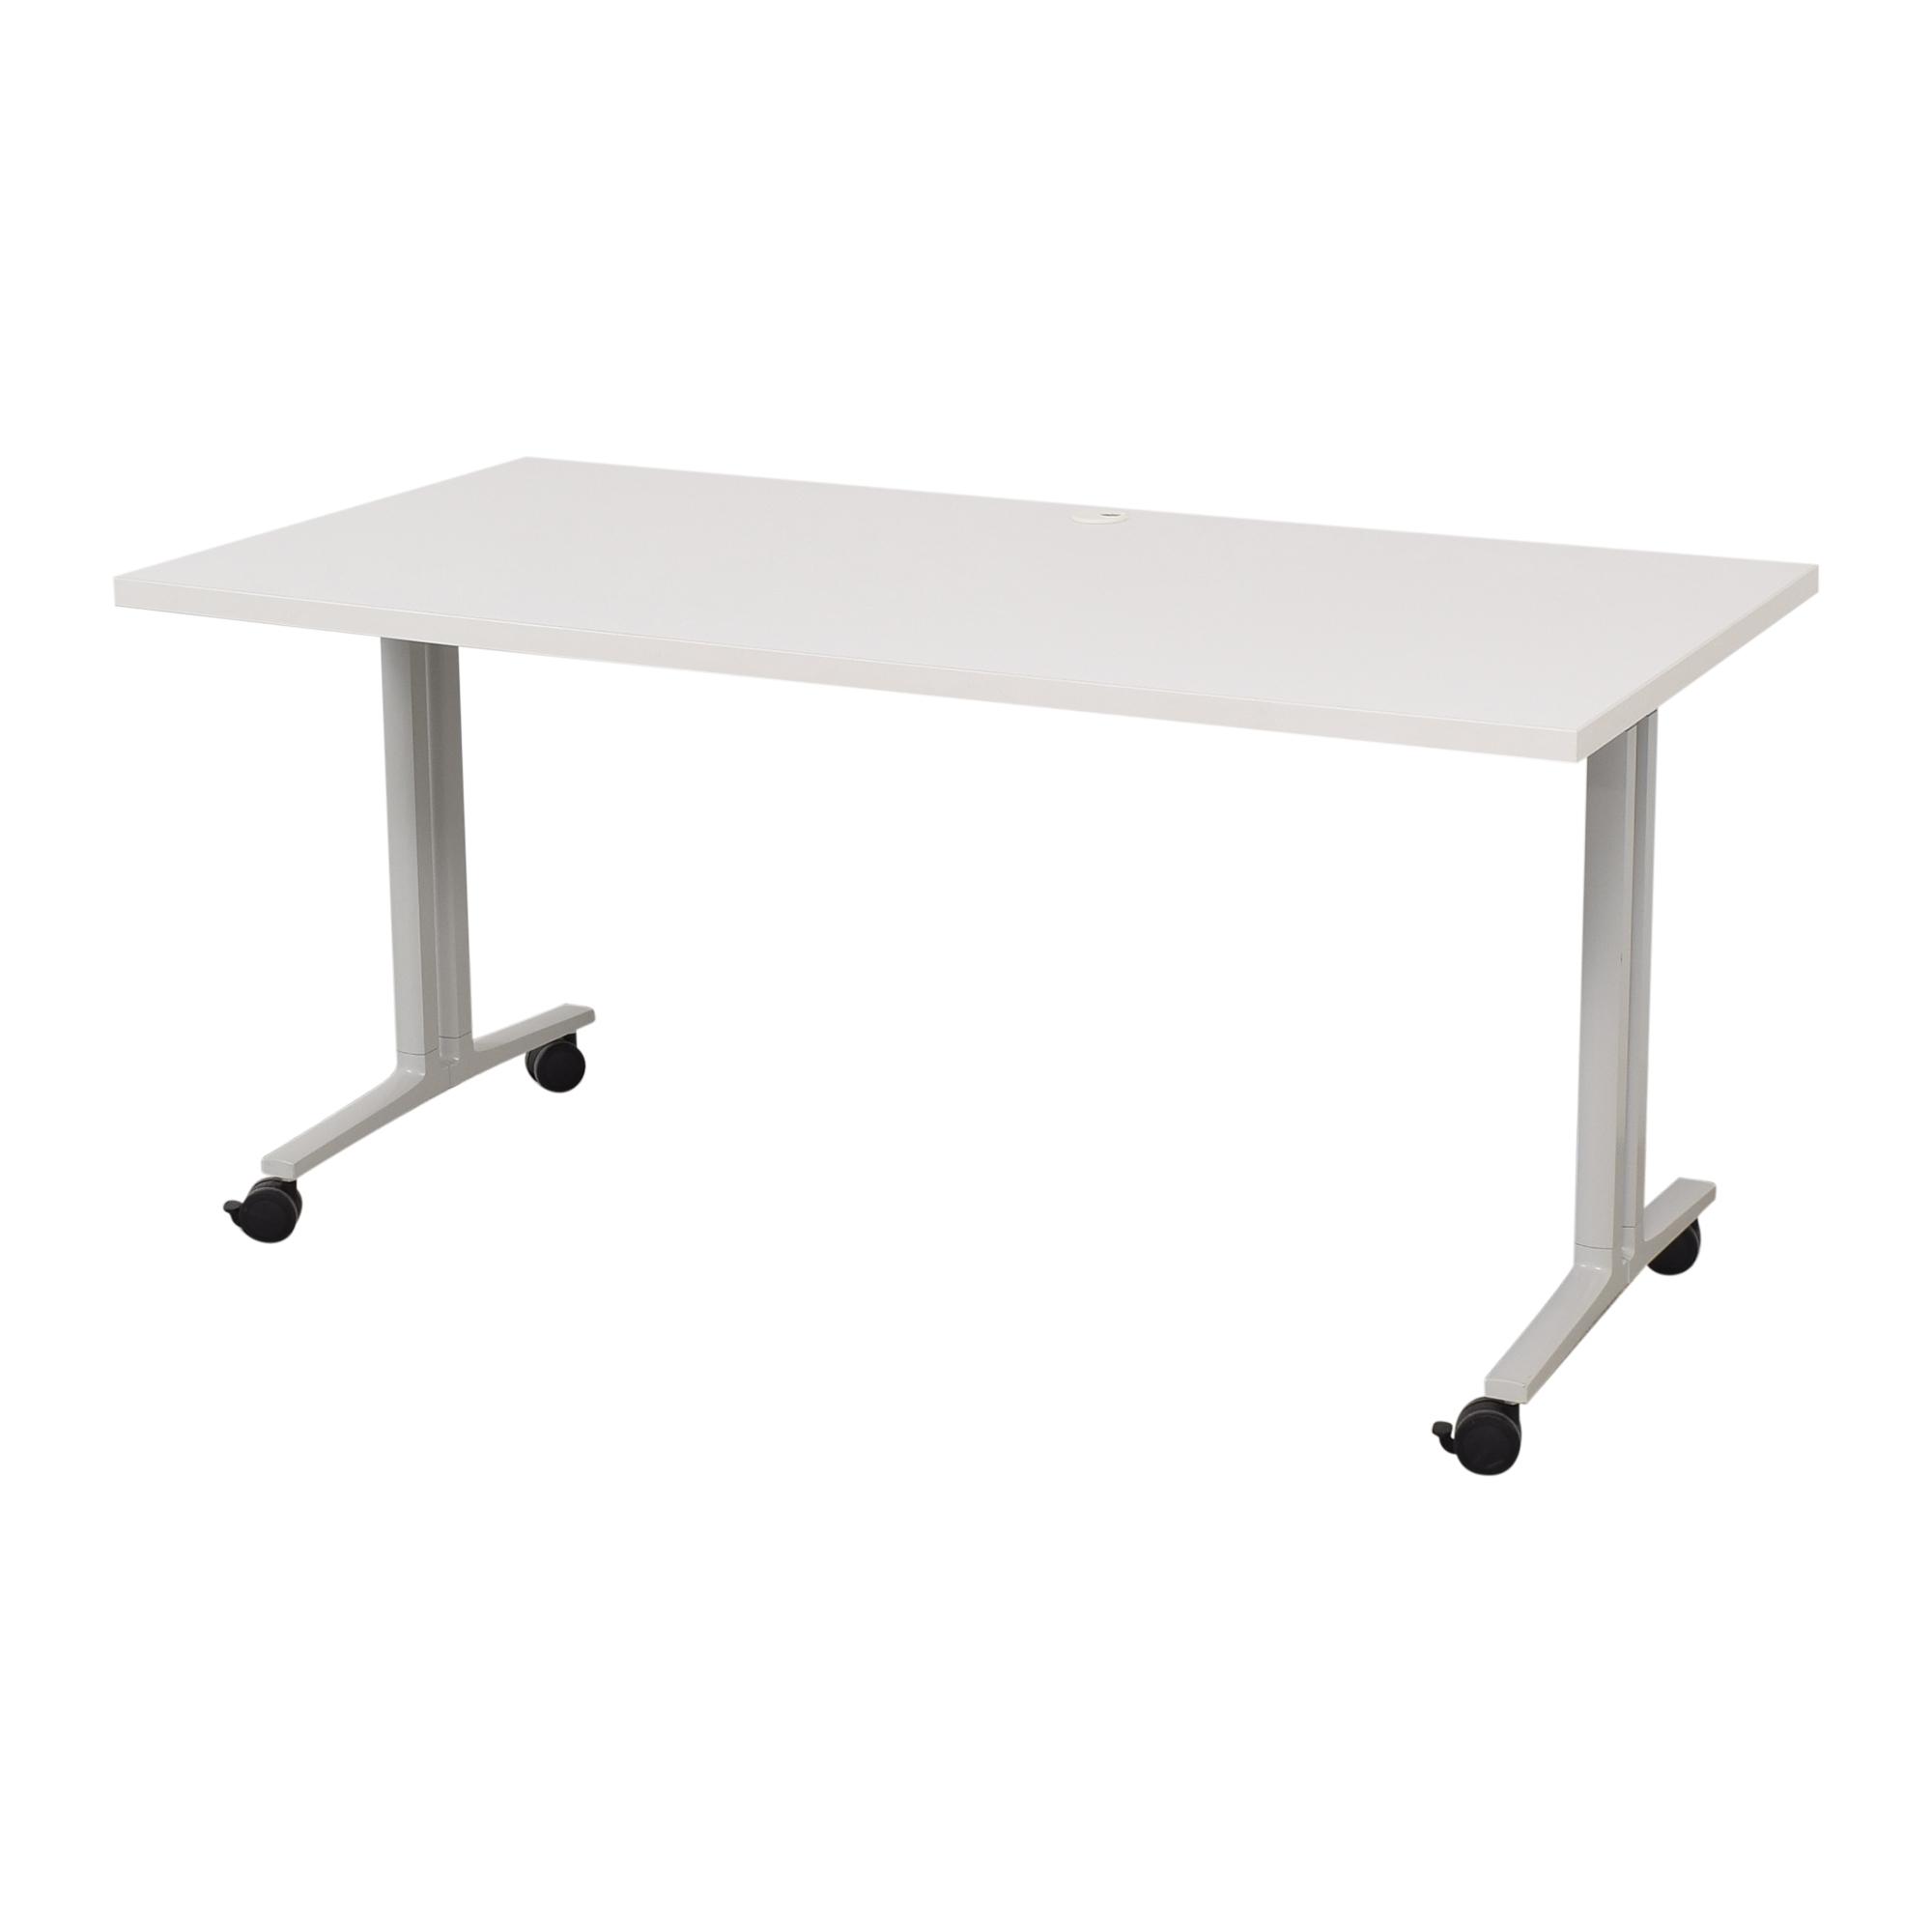 buy Herman Miller Herman Miller White Everywhere Tables Flip-Top Desk online